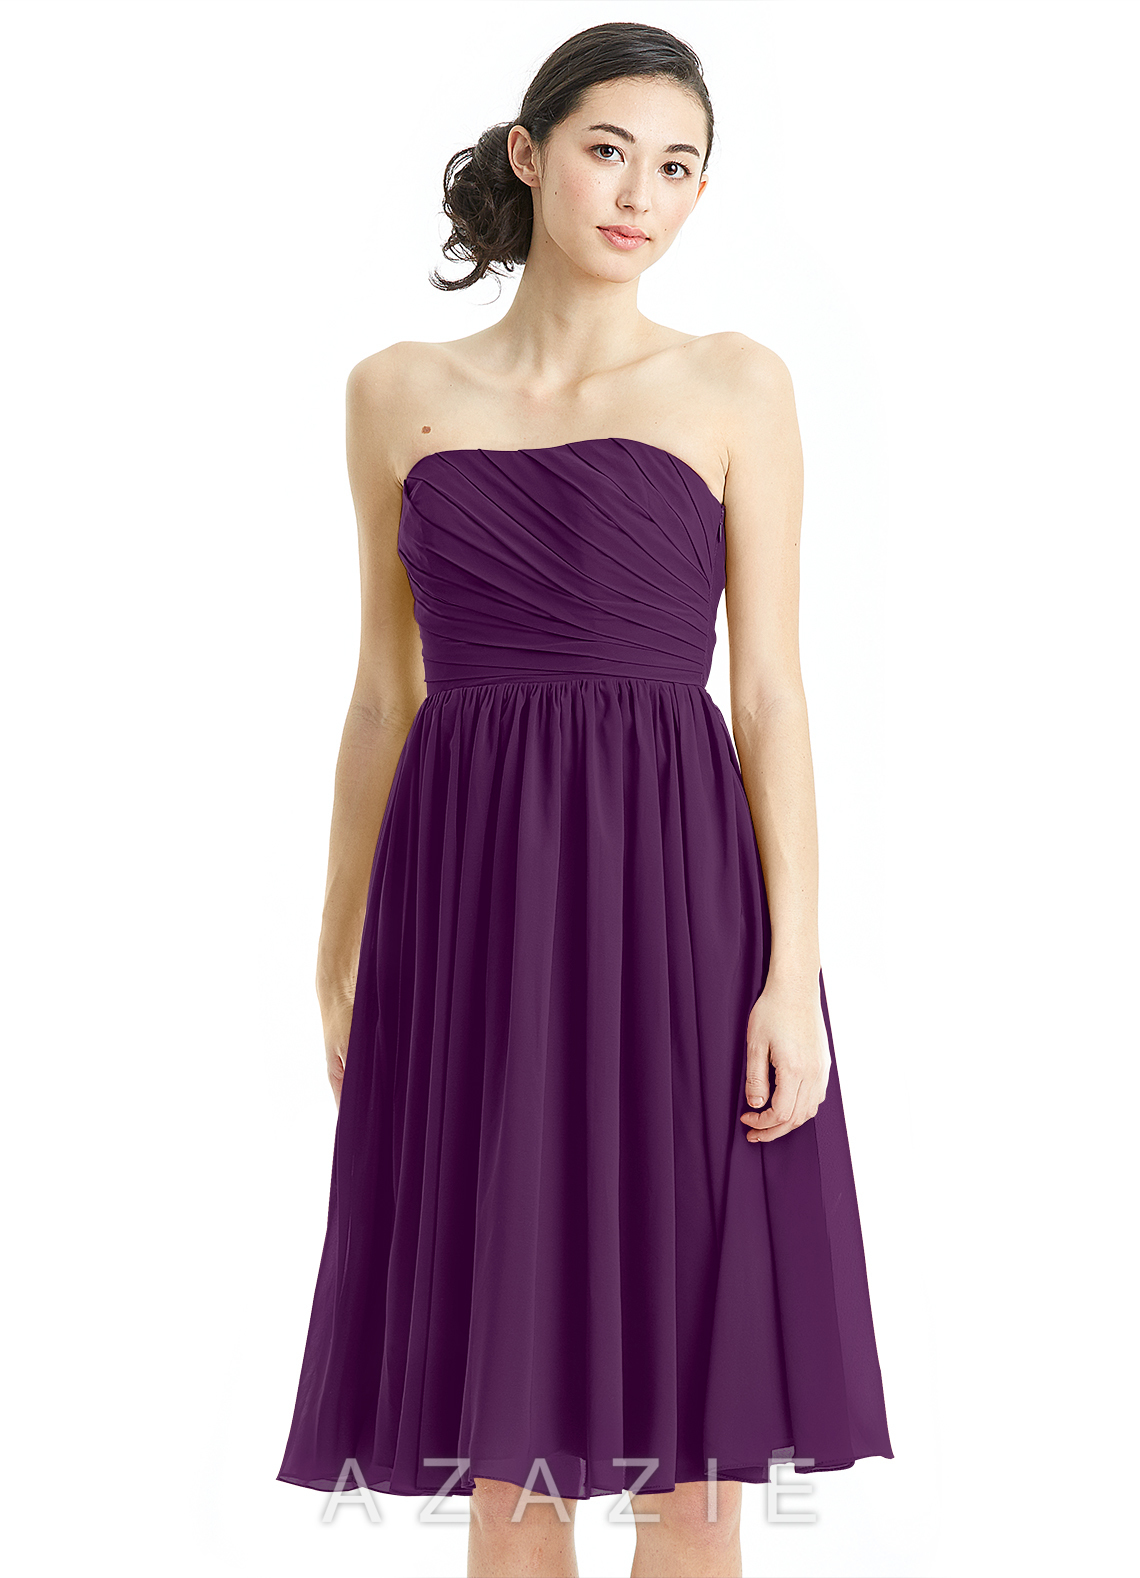 Azazie Katie Bridesmaid Dress   Azazie